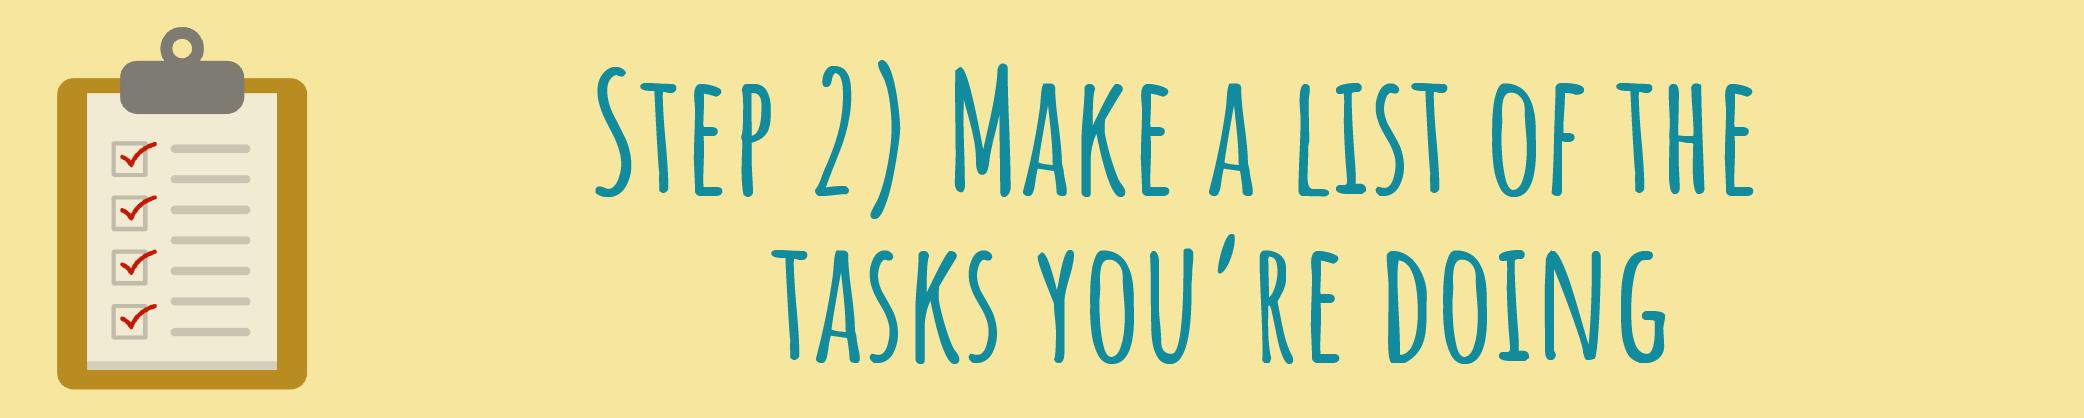 Step 2 - Make a List of Tasks